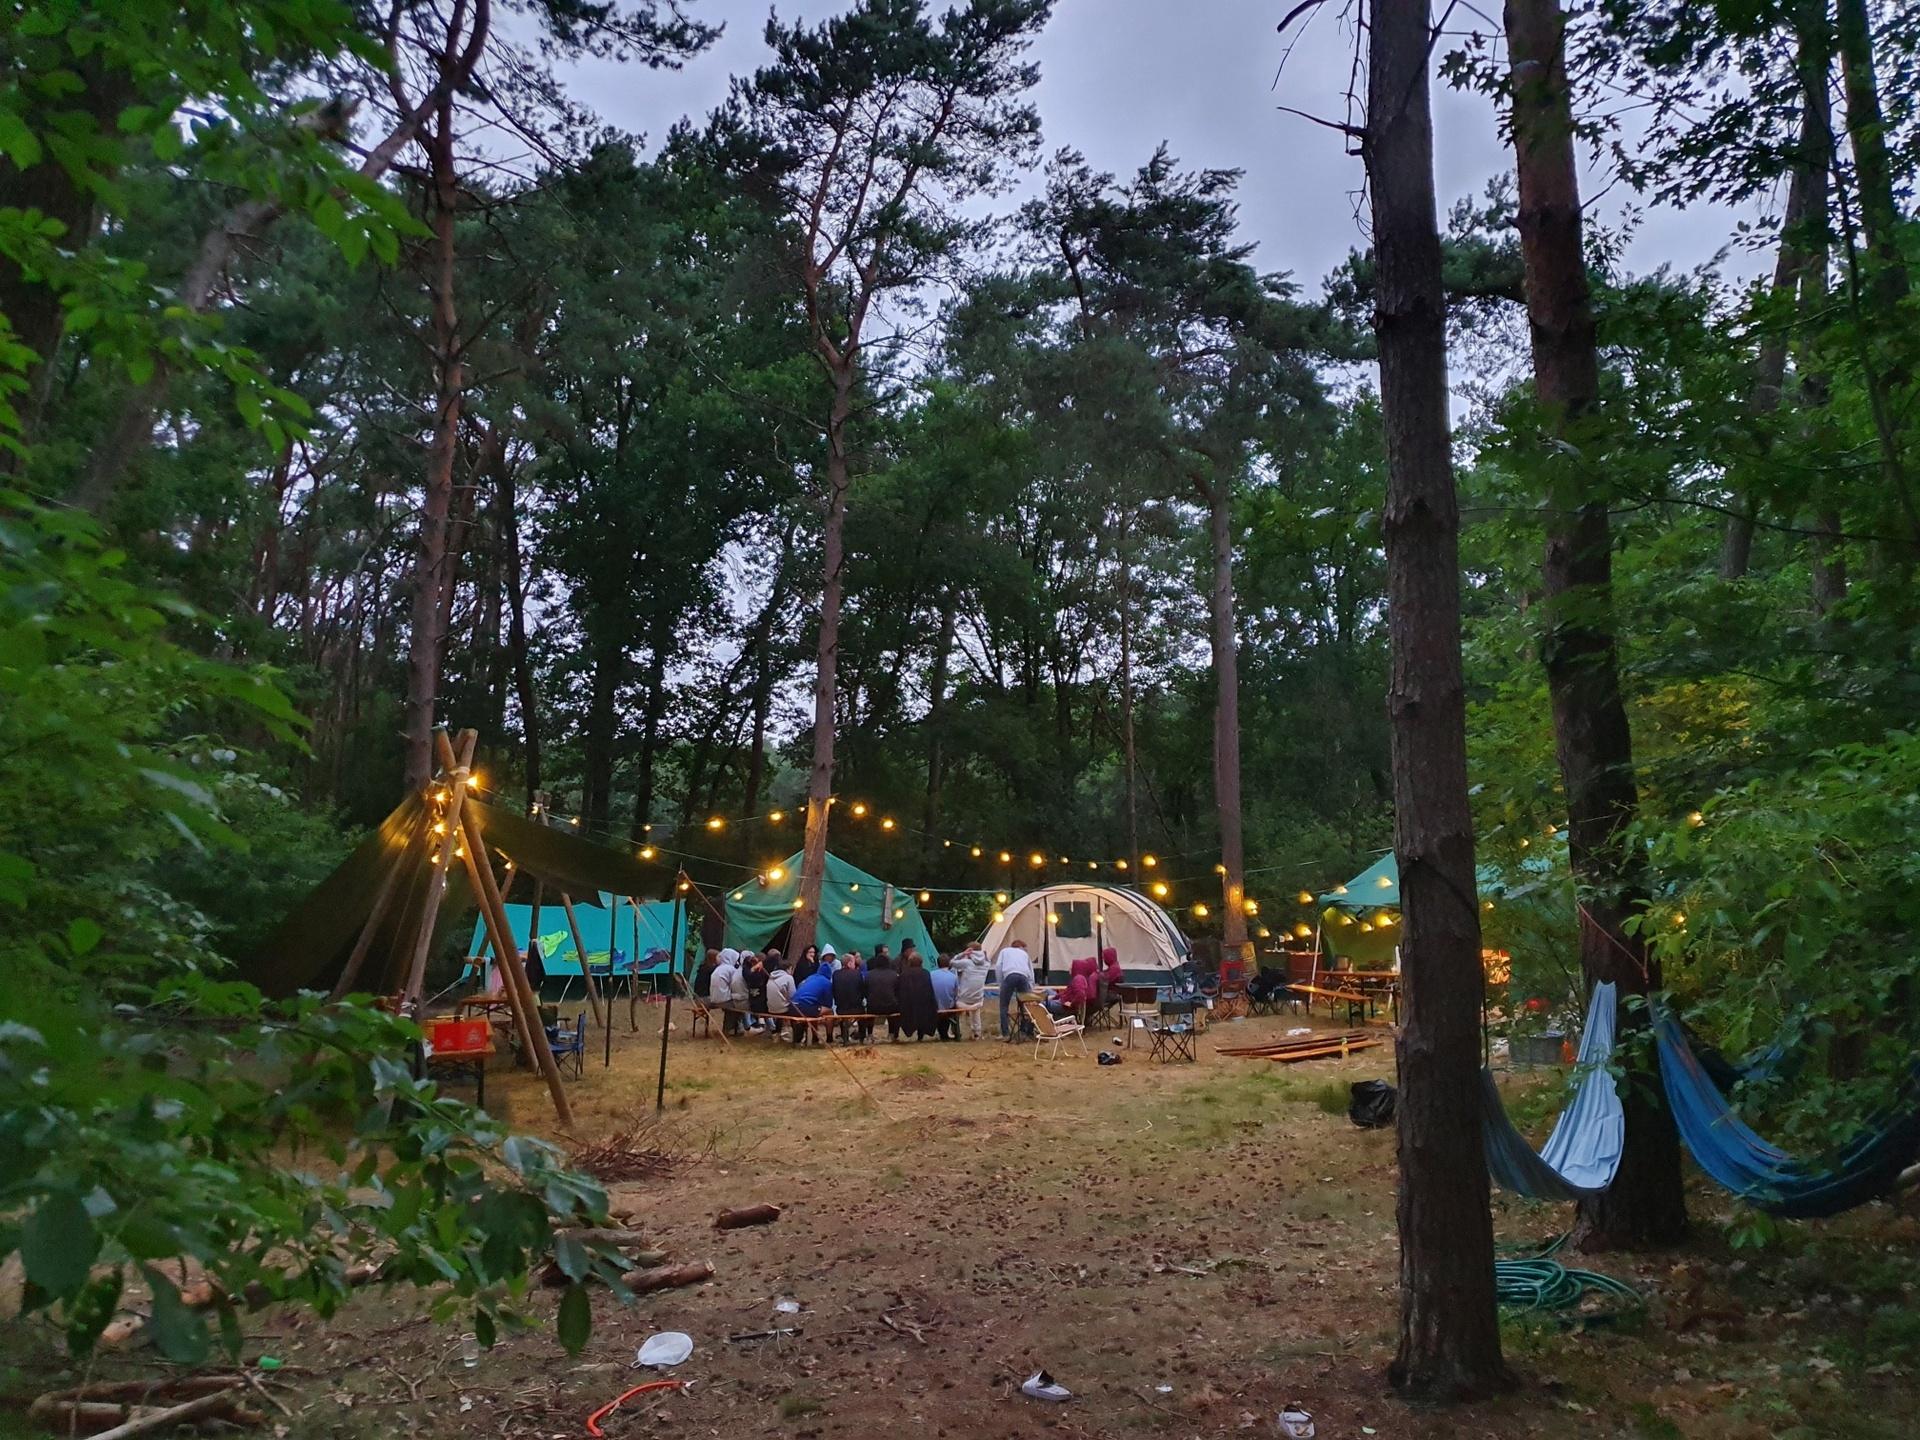 Midden het bos, prachtige avond